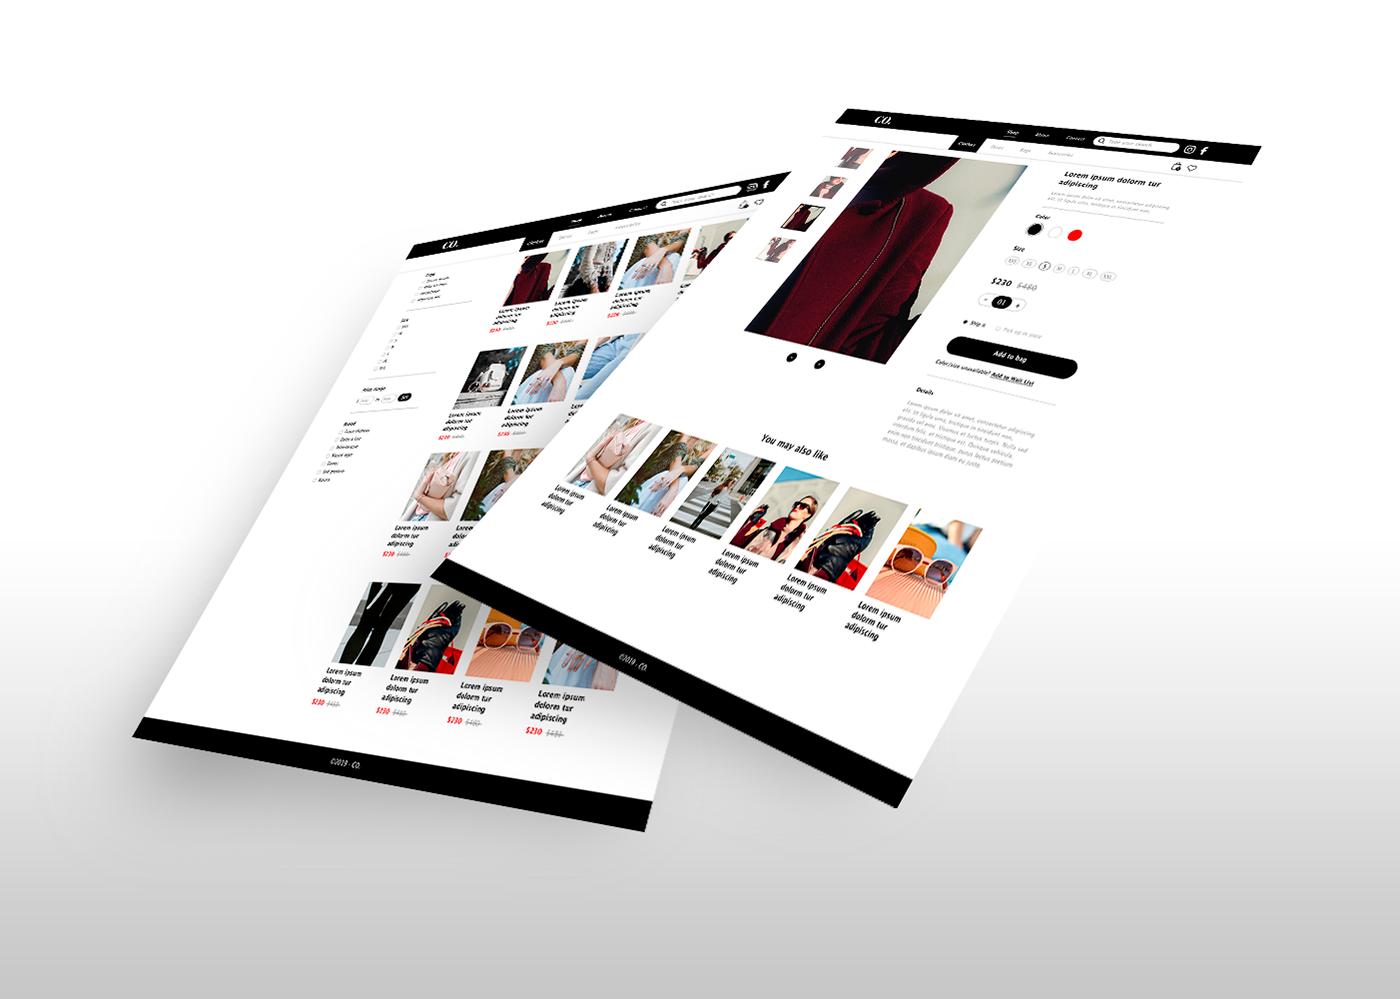 Virtual Store Web Design  design user interface UI ux graphic design  visual design inspiration